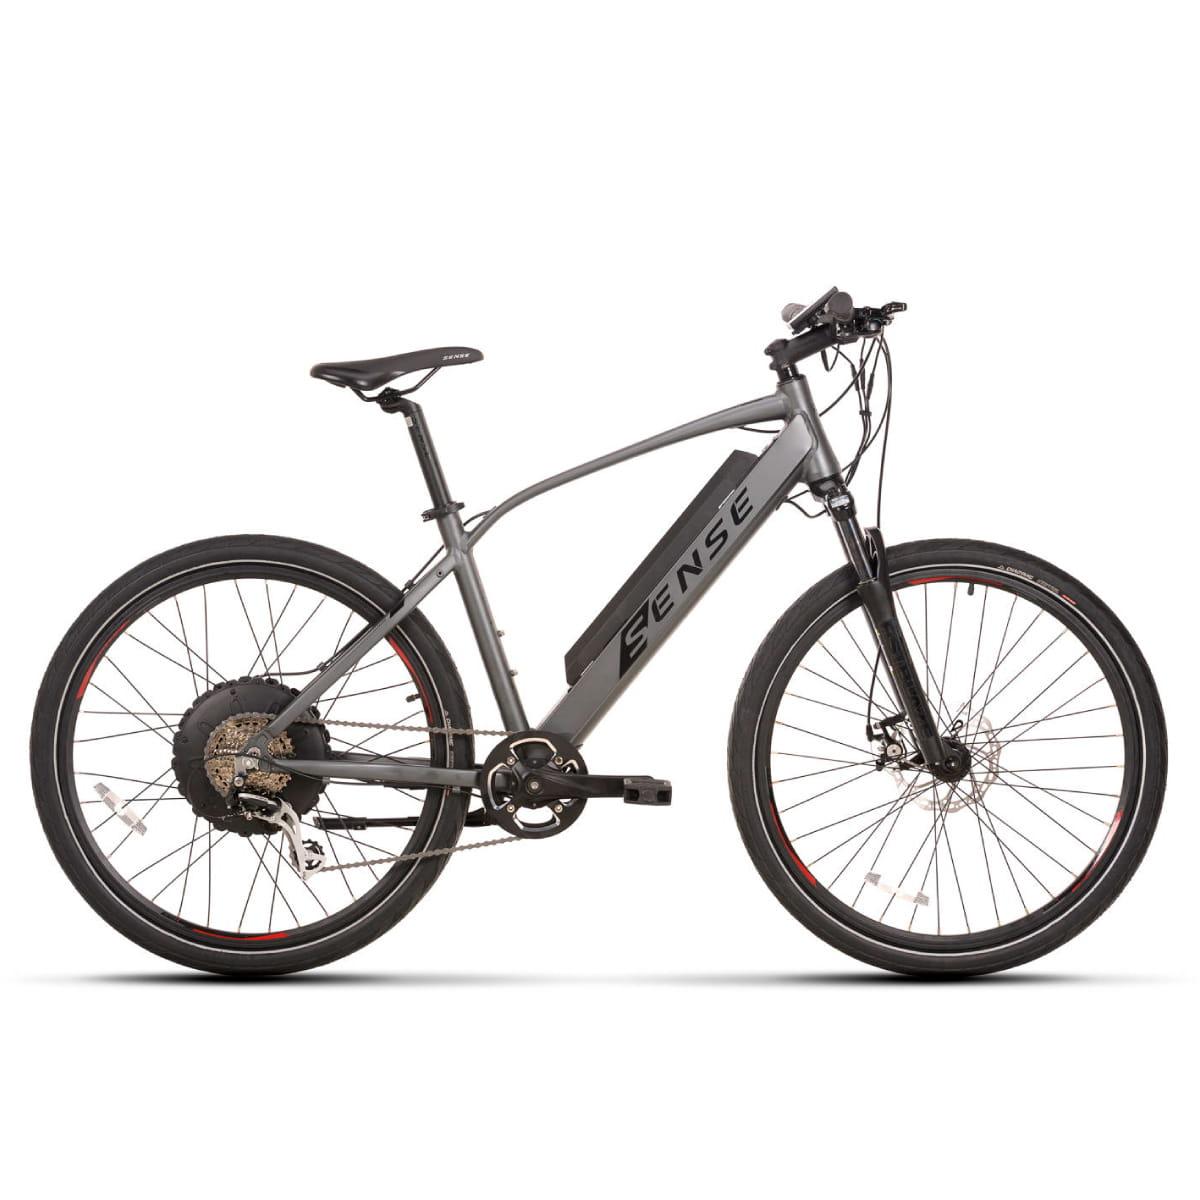 Bicicleta Elétrica Sense Impulse 2020 Original